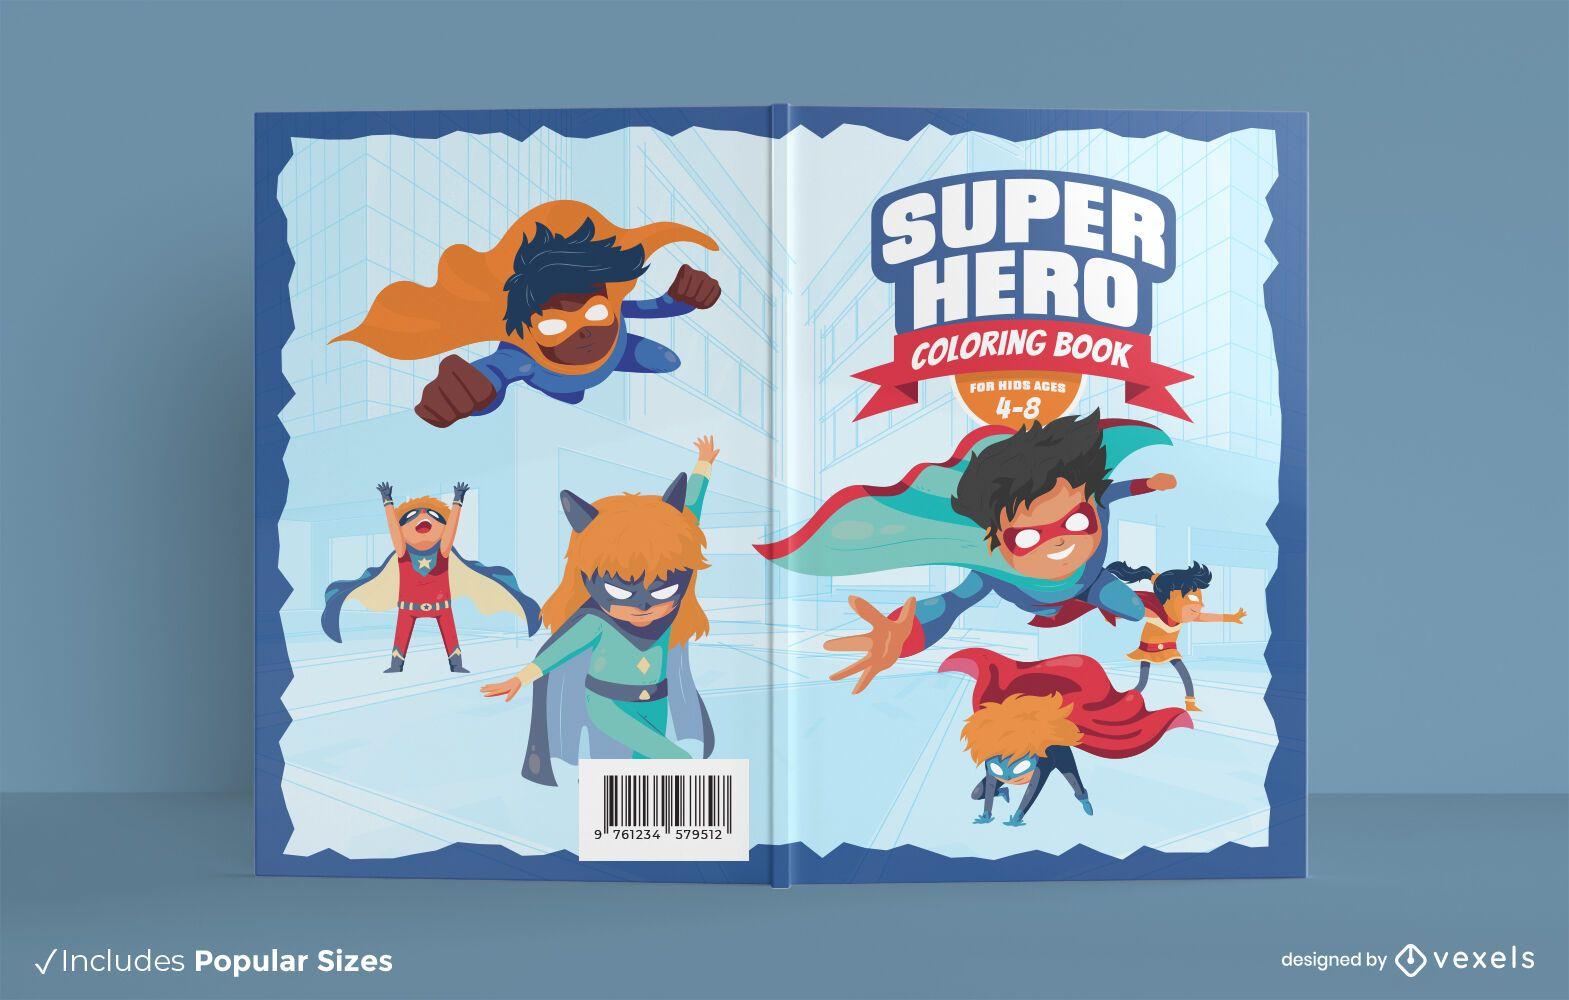 Super hero coloring book cover design